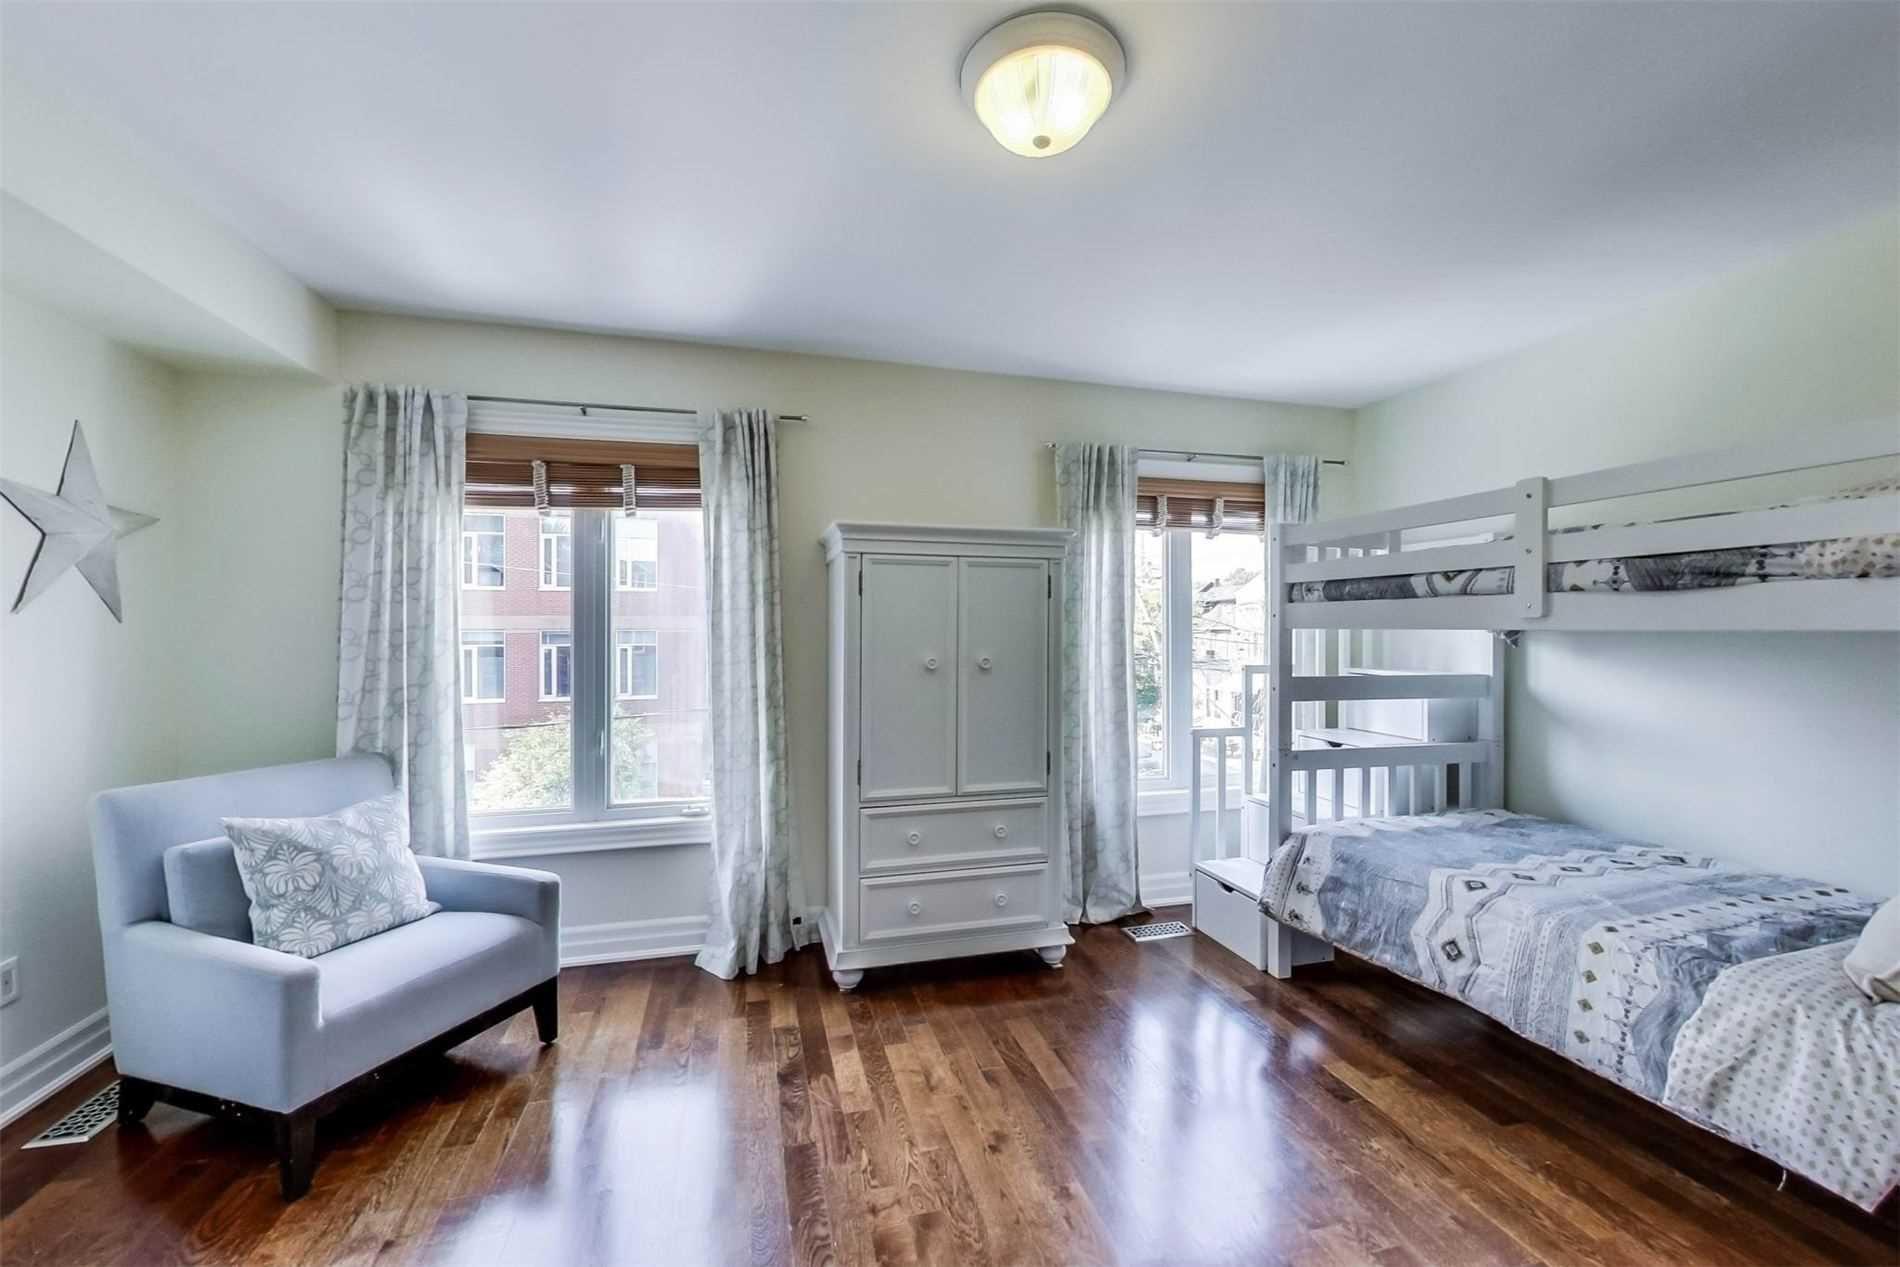 Photo 15: Photos: 213 Heward Avenue in Toronto: South Riverdale House (3-Storey) for sale (Toronto E01)  : MLS®# E4941877